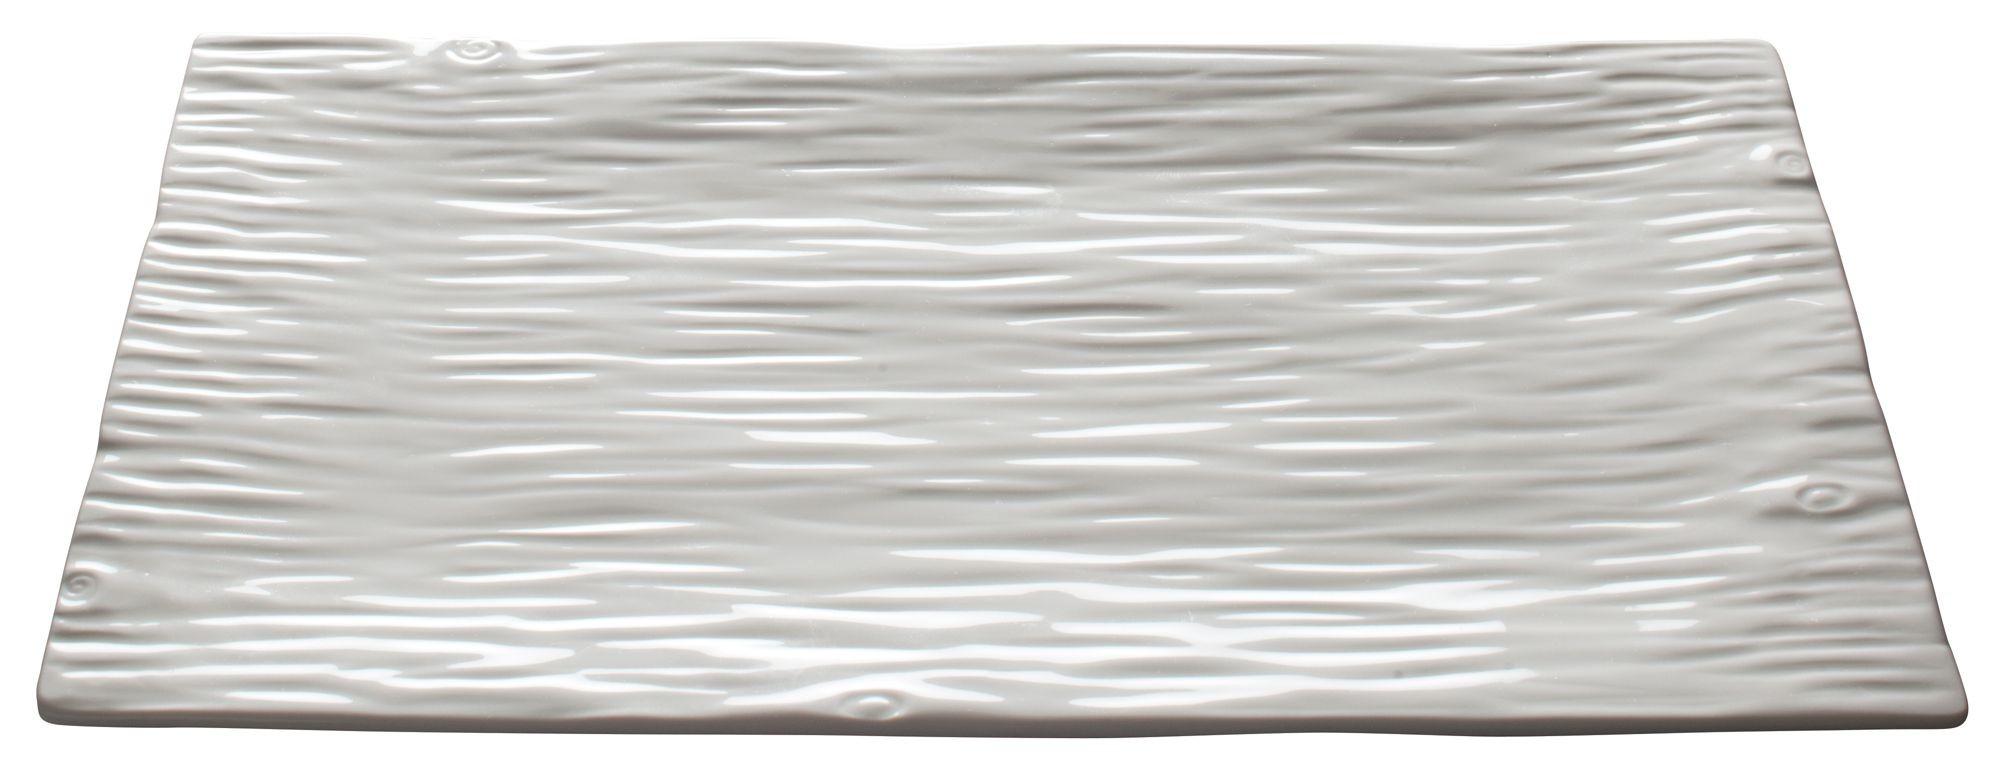 "Winco WDP002-202 Dalmata Creamy White Porcelain Rectangular Platter 14"" x 8-1/8"""